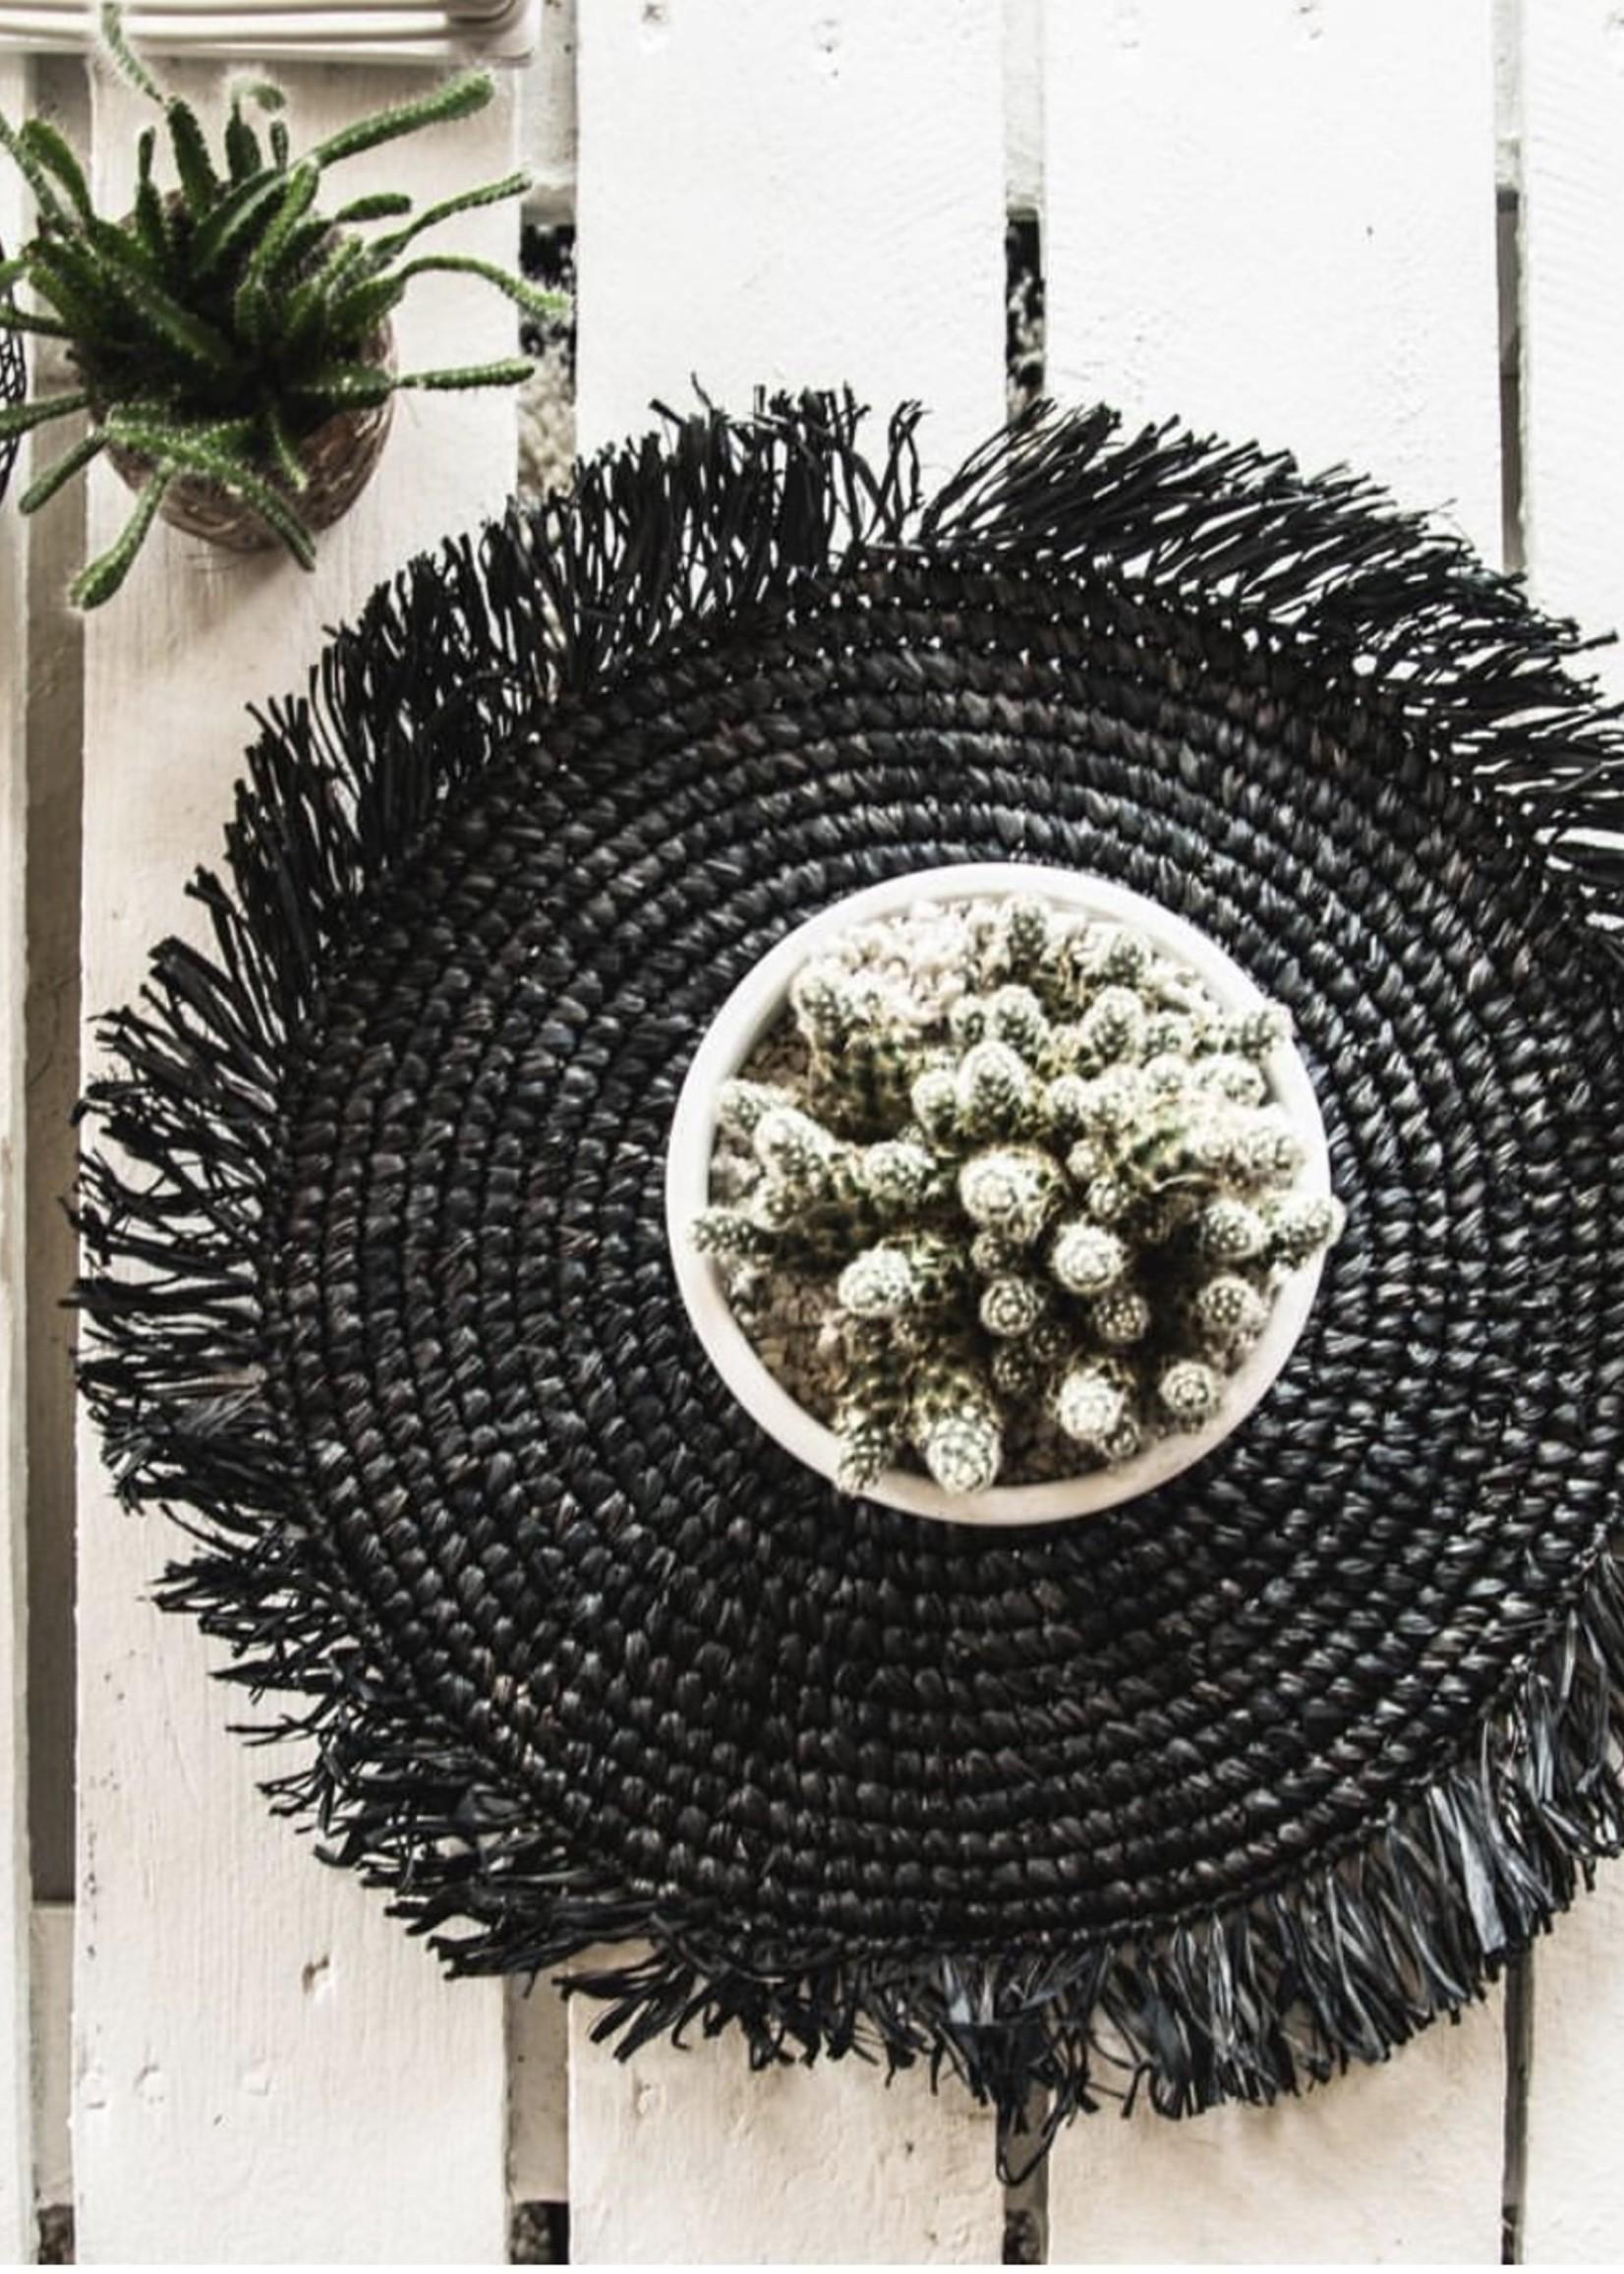 The Fringe Raffia Placemat Round - Black